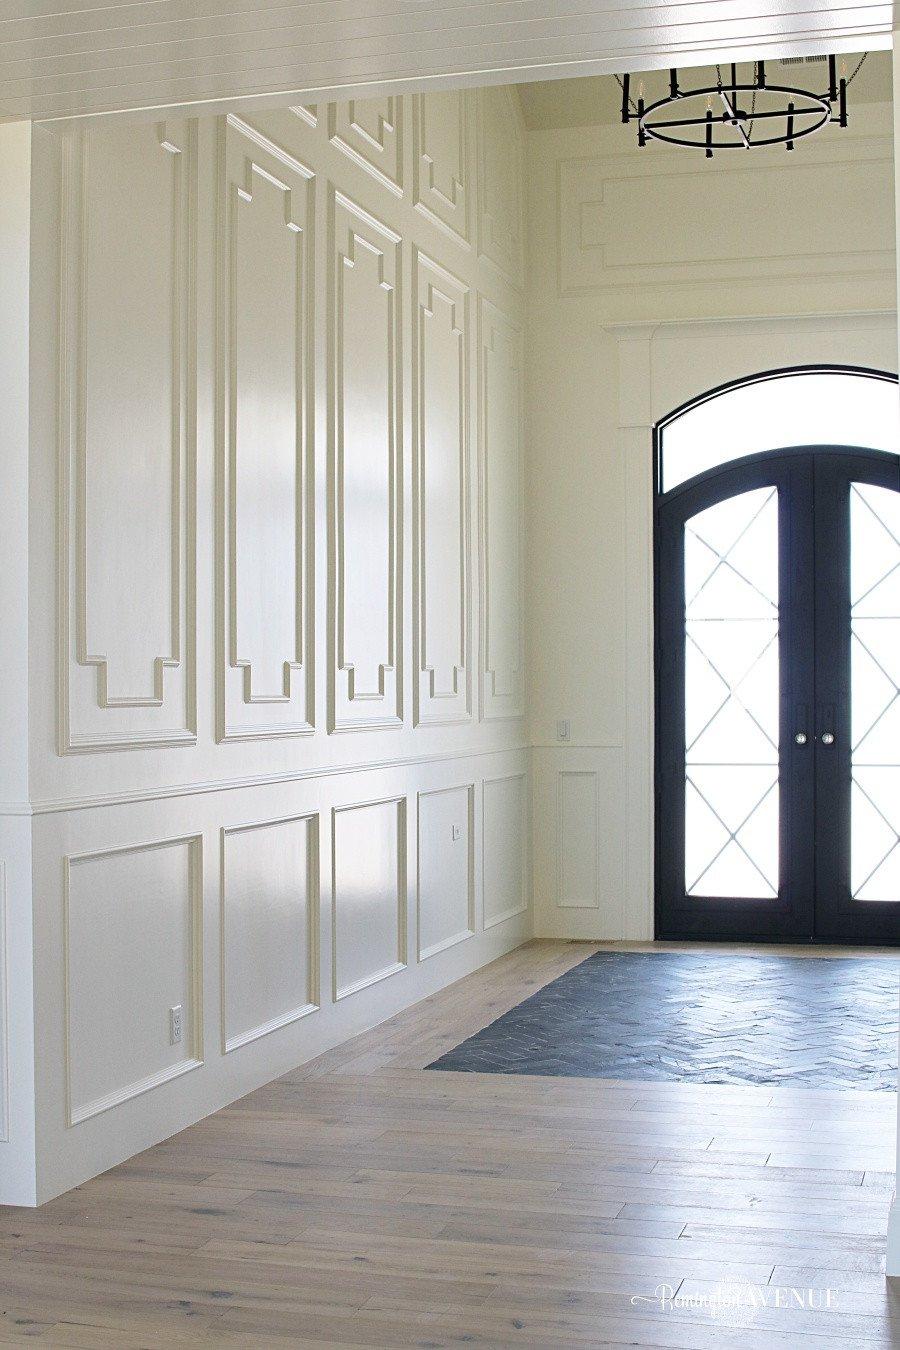 Warm Comfortable Living Room Inspirational Creating A Warm and fortable Living Room 9 Remington Avenue